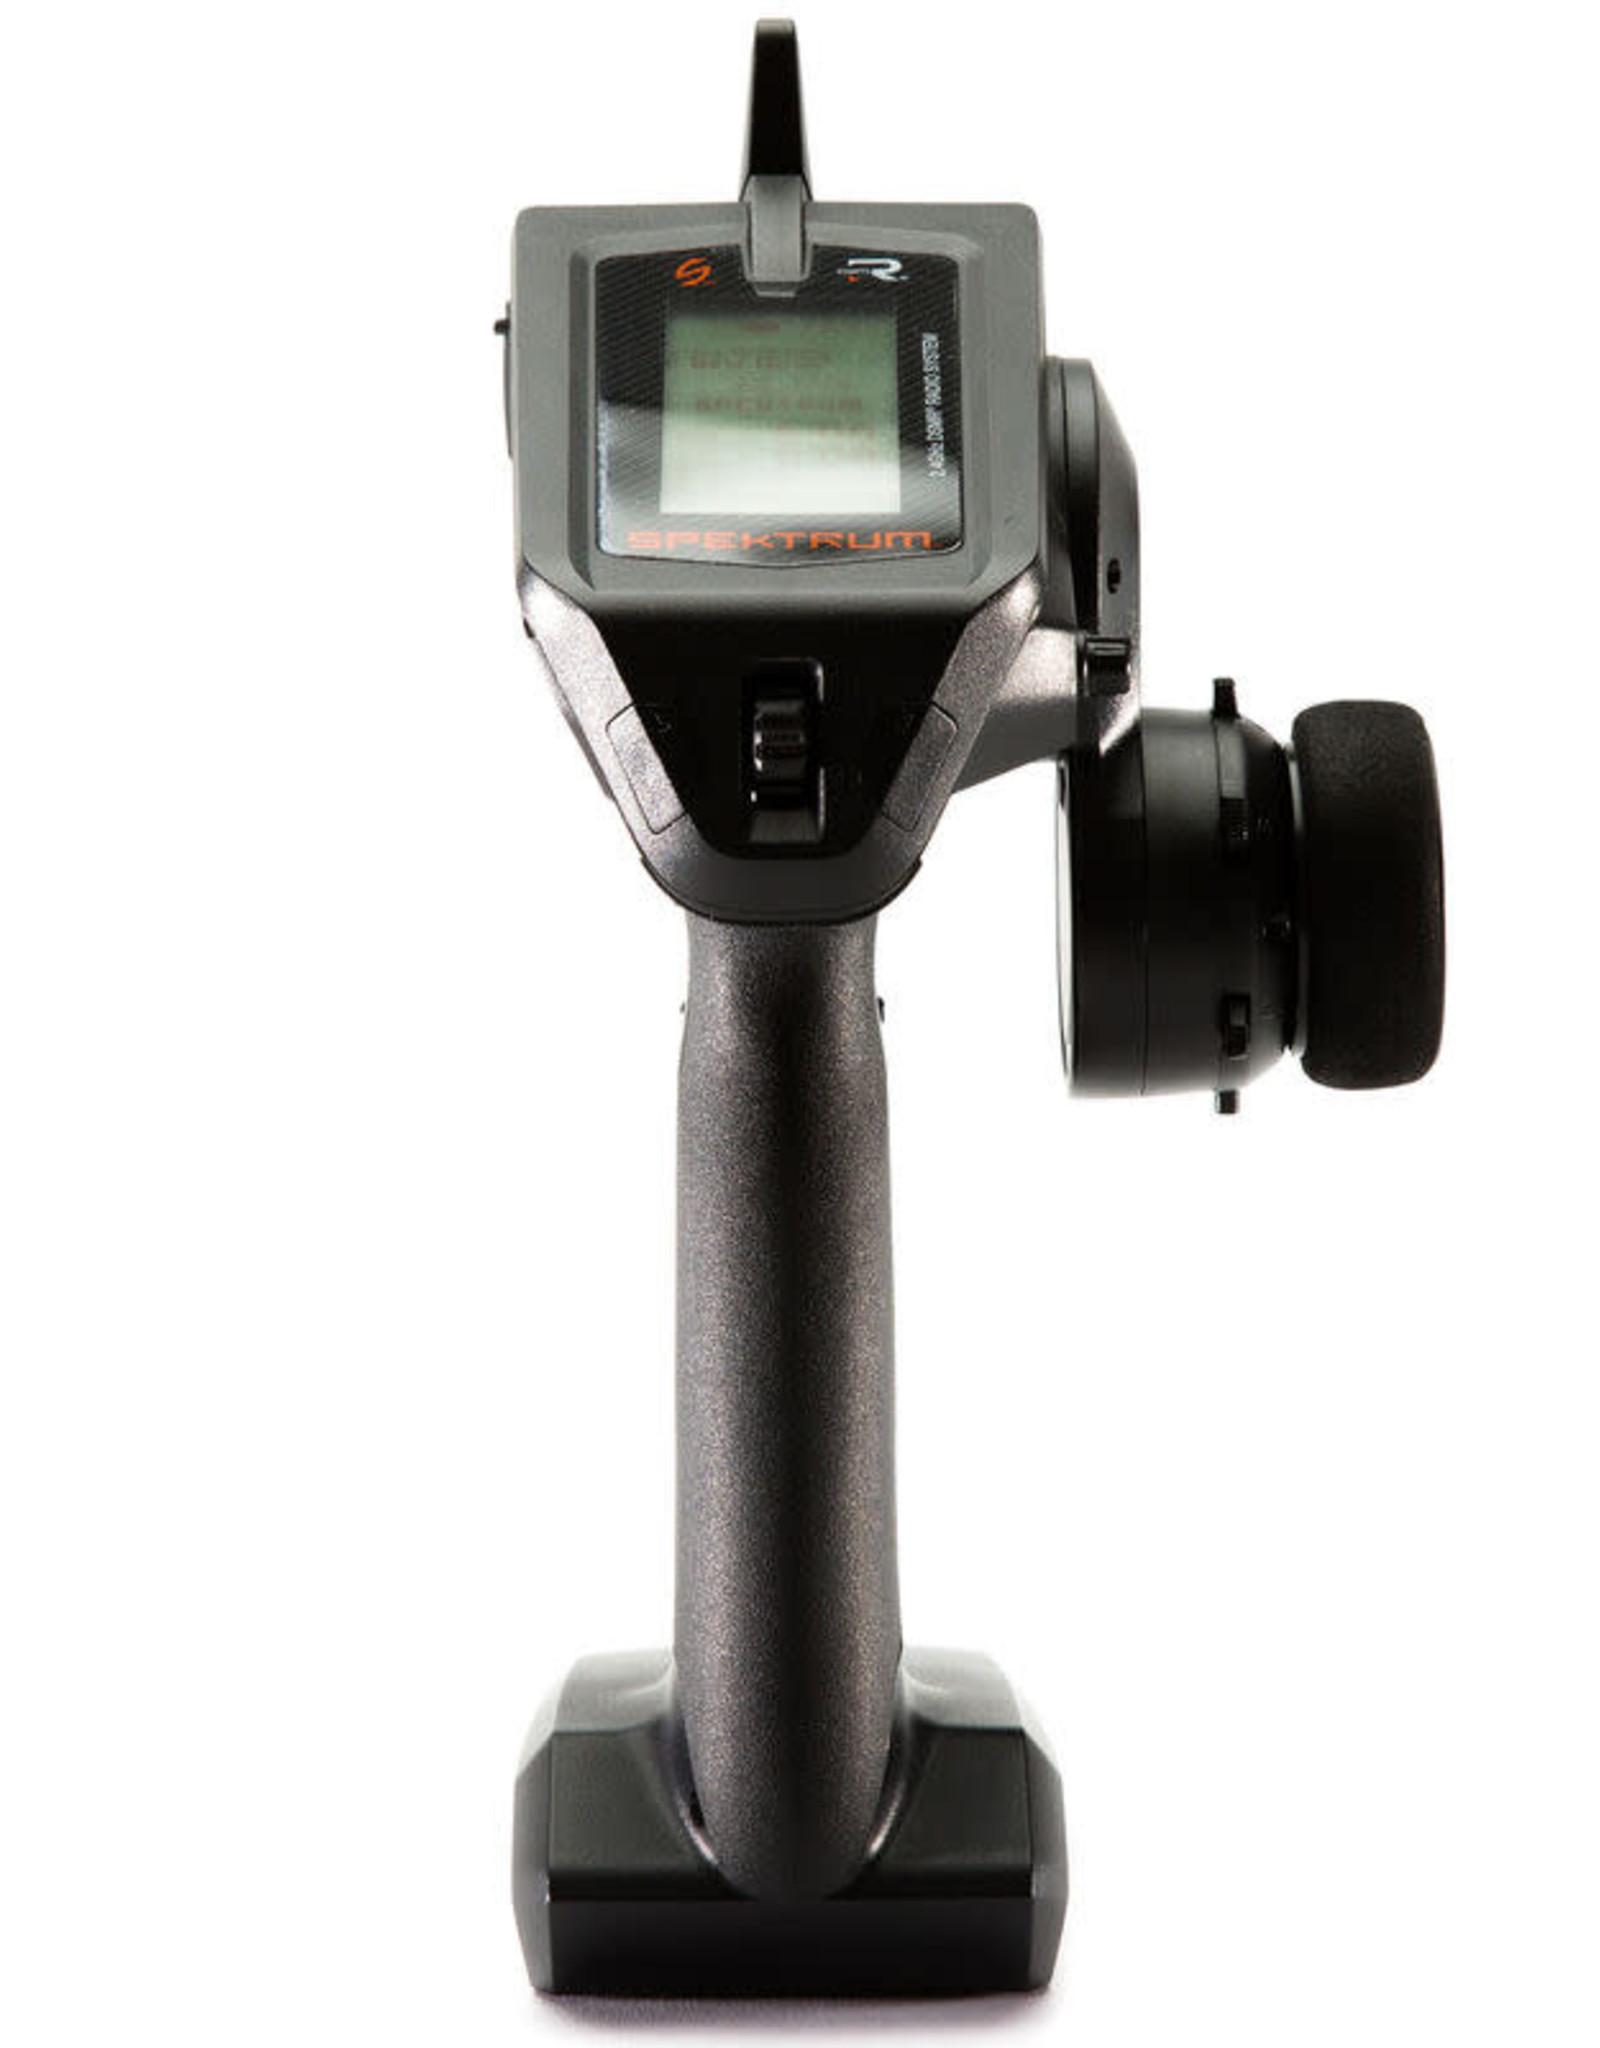 spektrum SPM5010 DX5 Pro 5-Channel DSMR Transmitter with SR2100 (SPM5010)